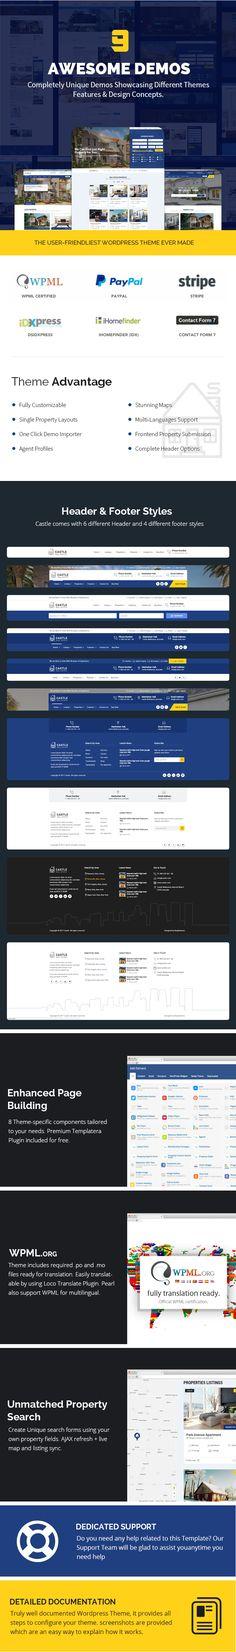 Castle - Real Estate WordPress Theme by BrighThemes | ThemeForest